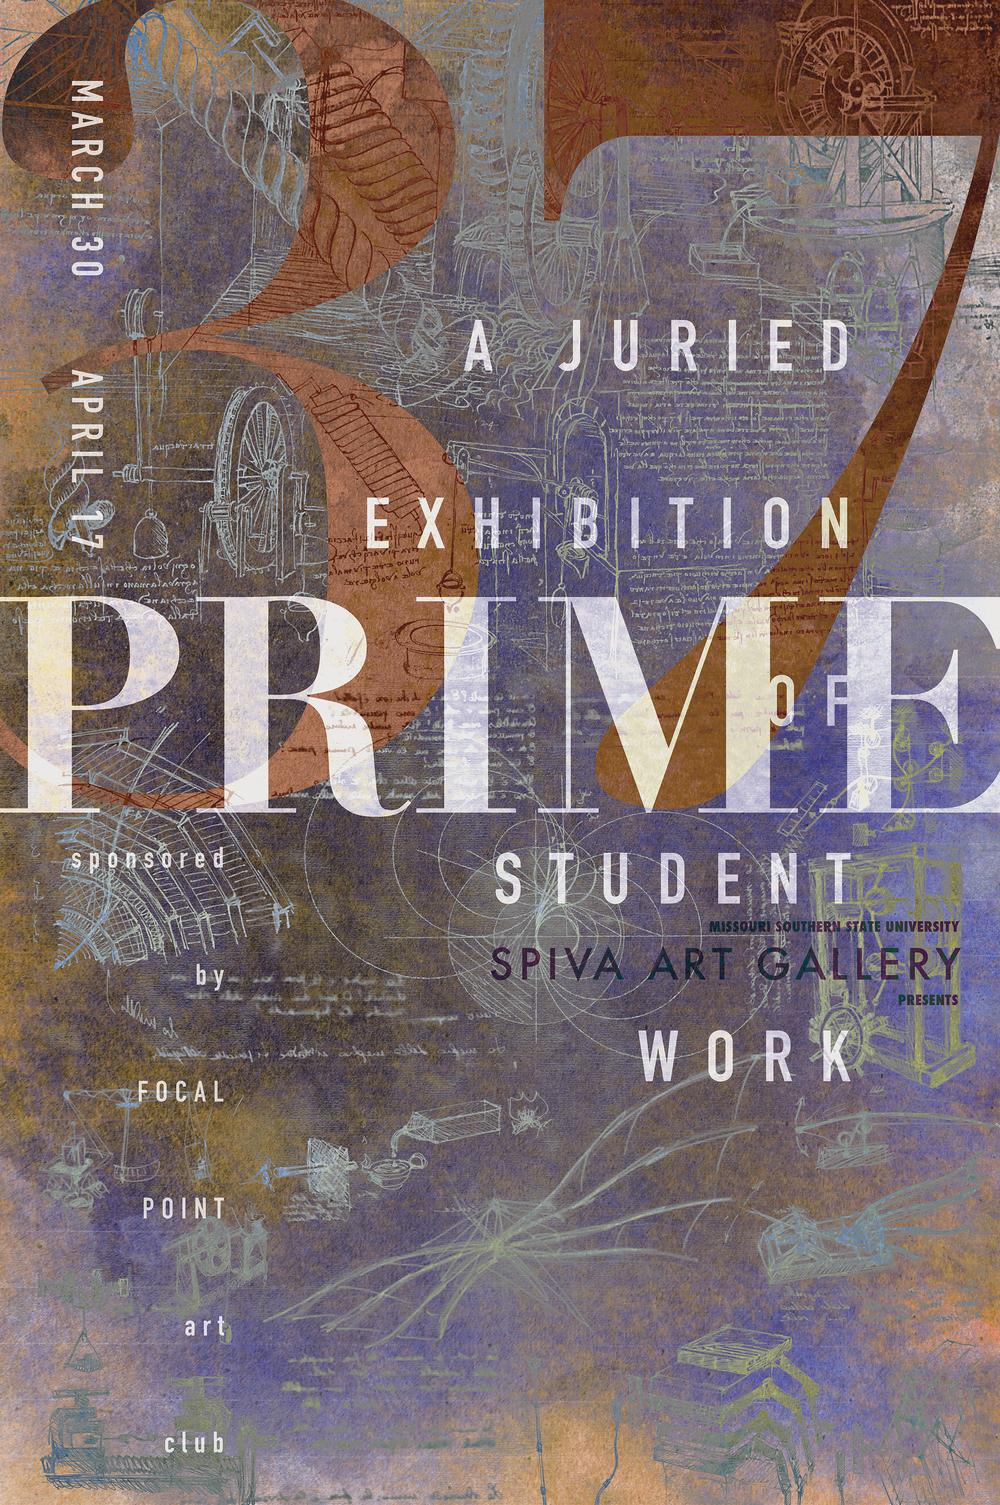 37 PRIME, MSSU Student Exhibition